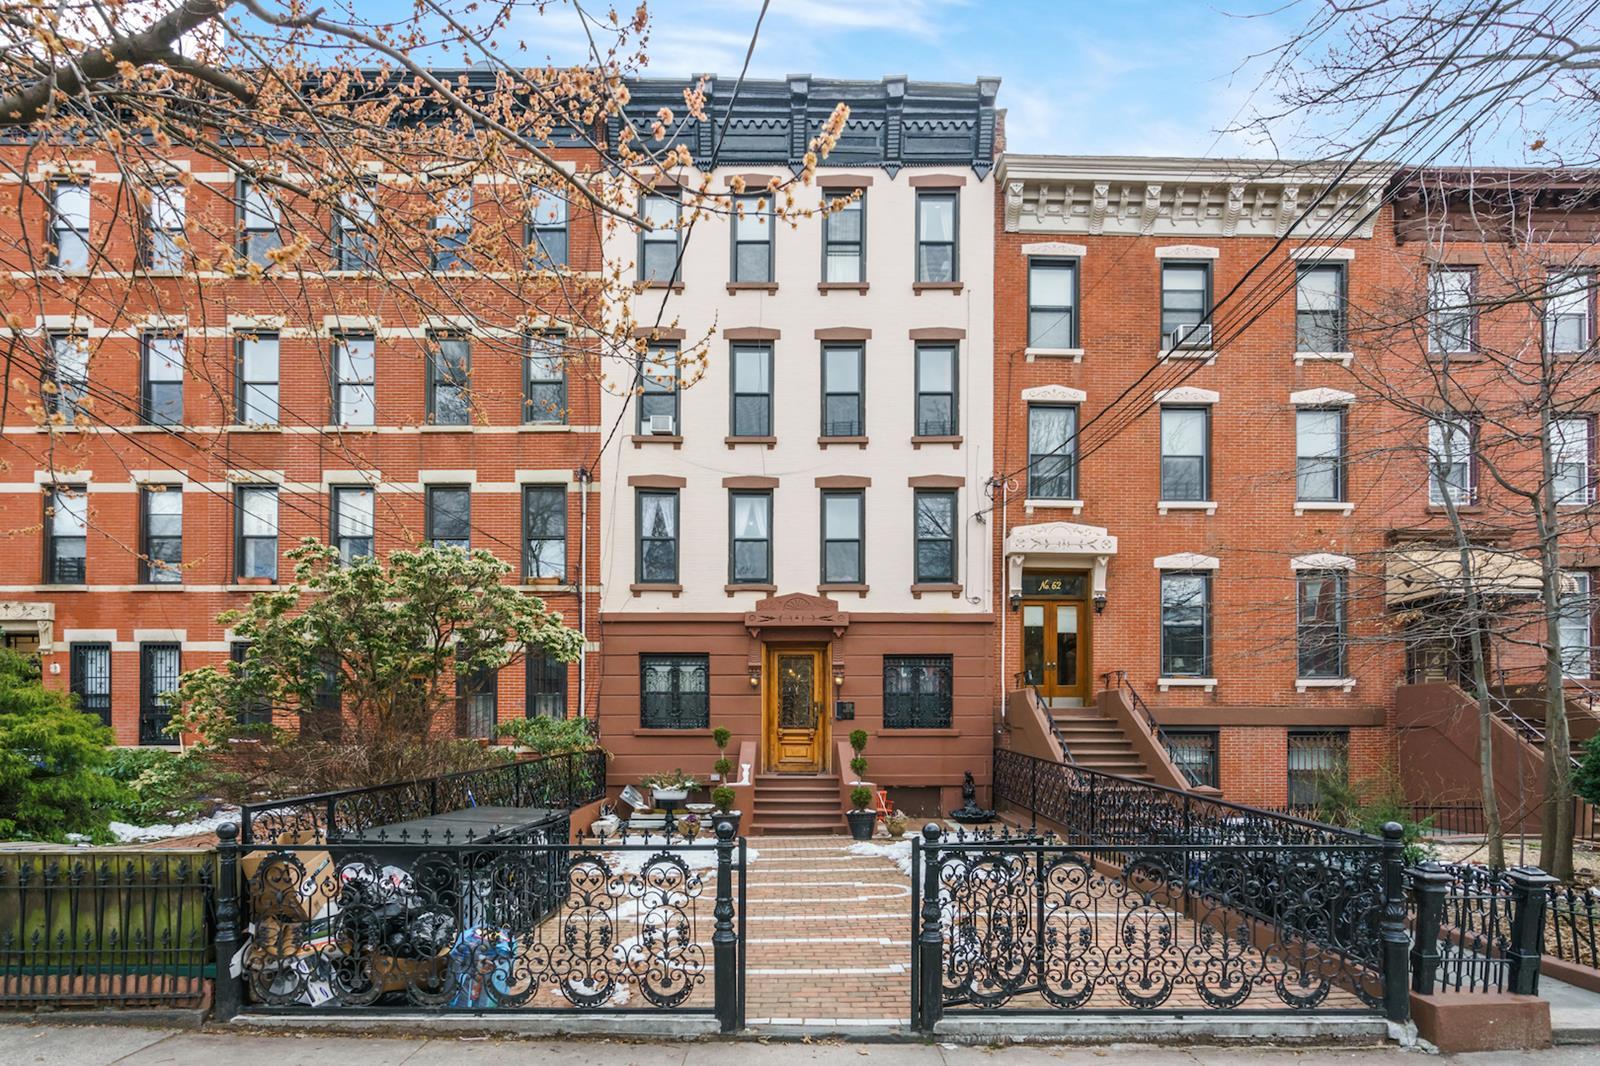 64 4th Place Carroll Gardens Brooklyn NY 11231